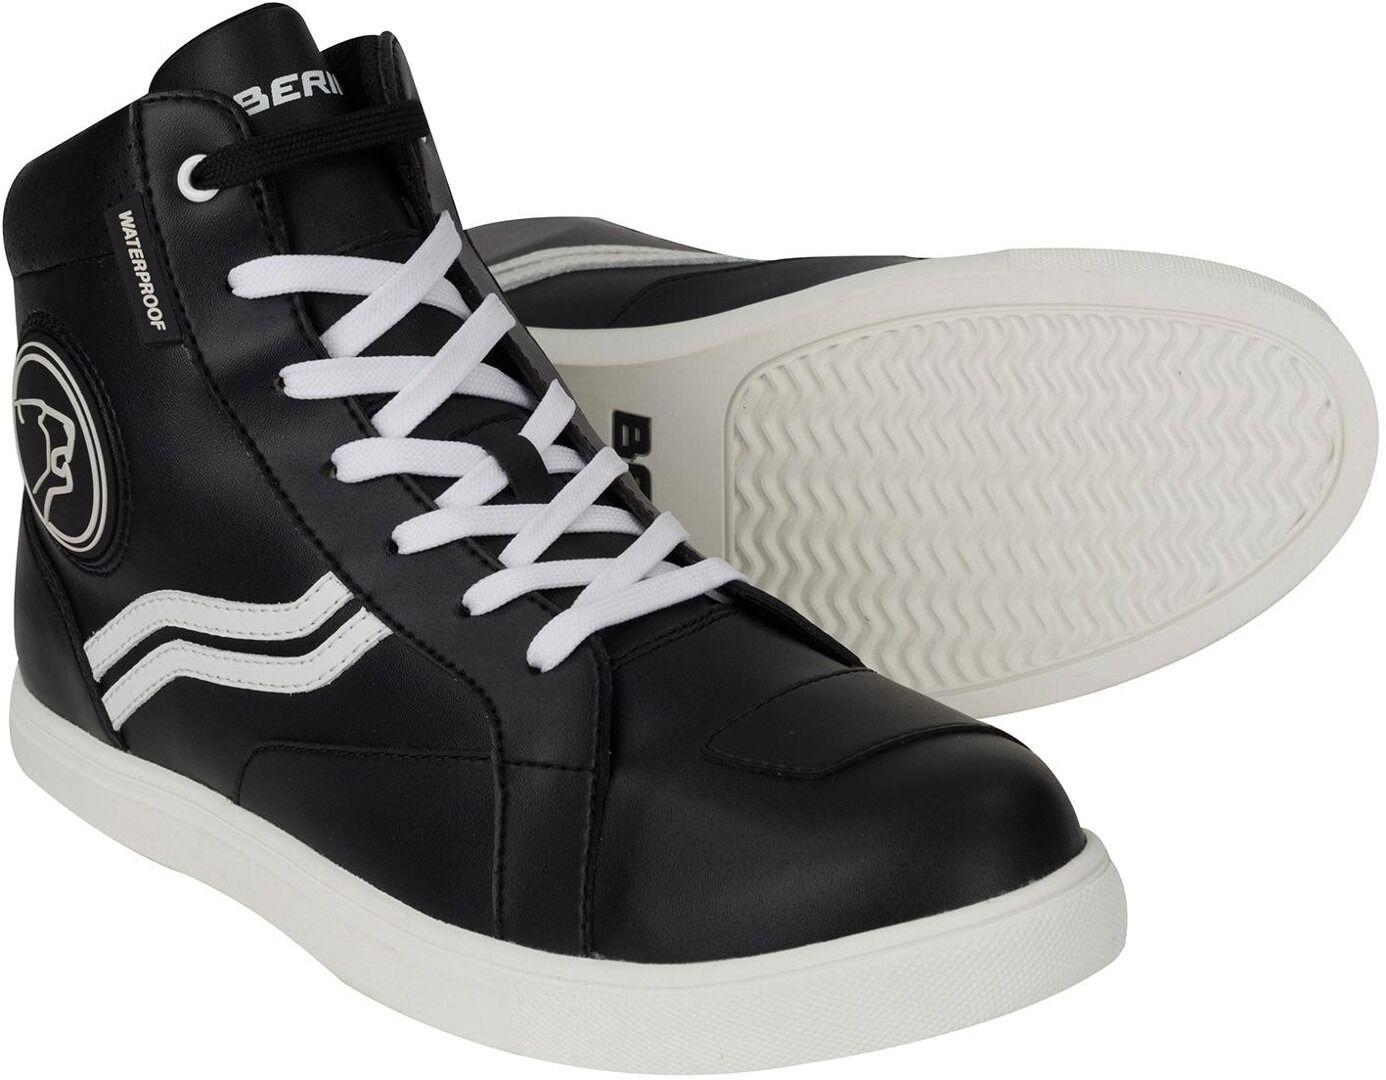 Bering Stars Chaussures de moto Noir Blanc taille : 39